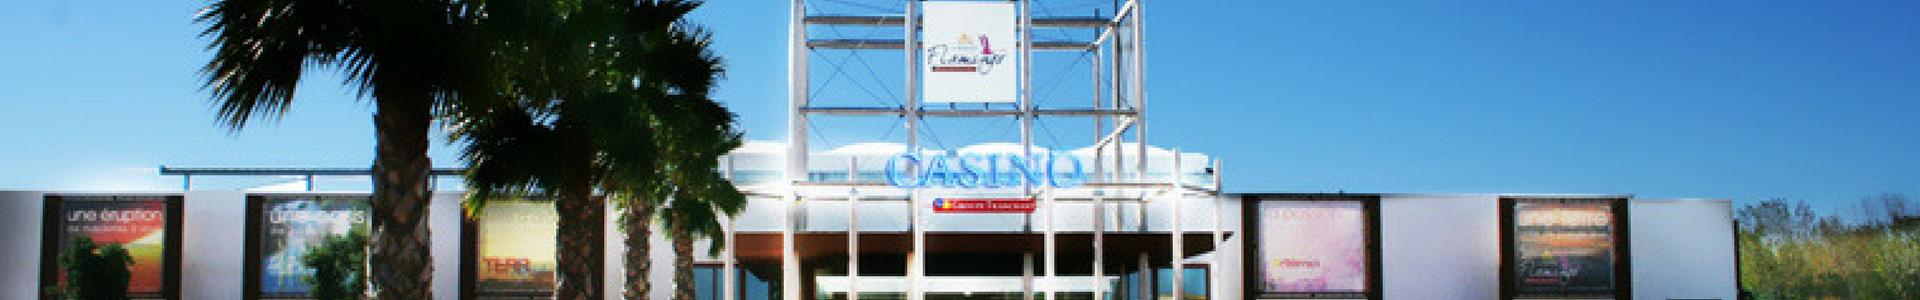 casino-le-grau-du-roi-1620